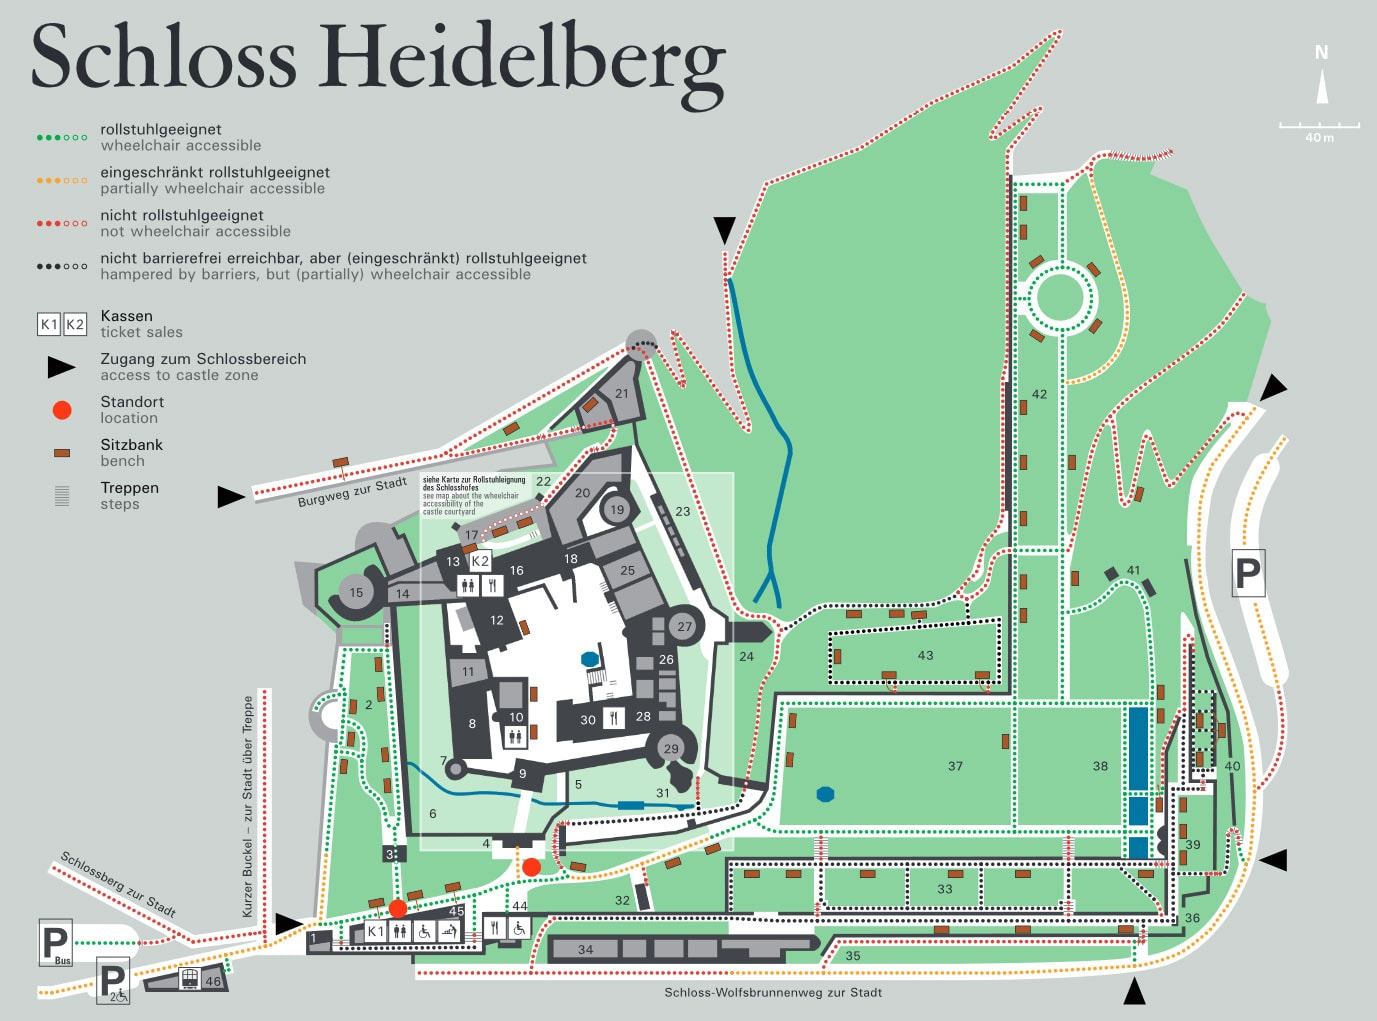 Heidelberg Castle, paths, stroller, wheelchair, map